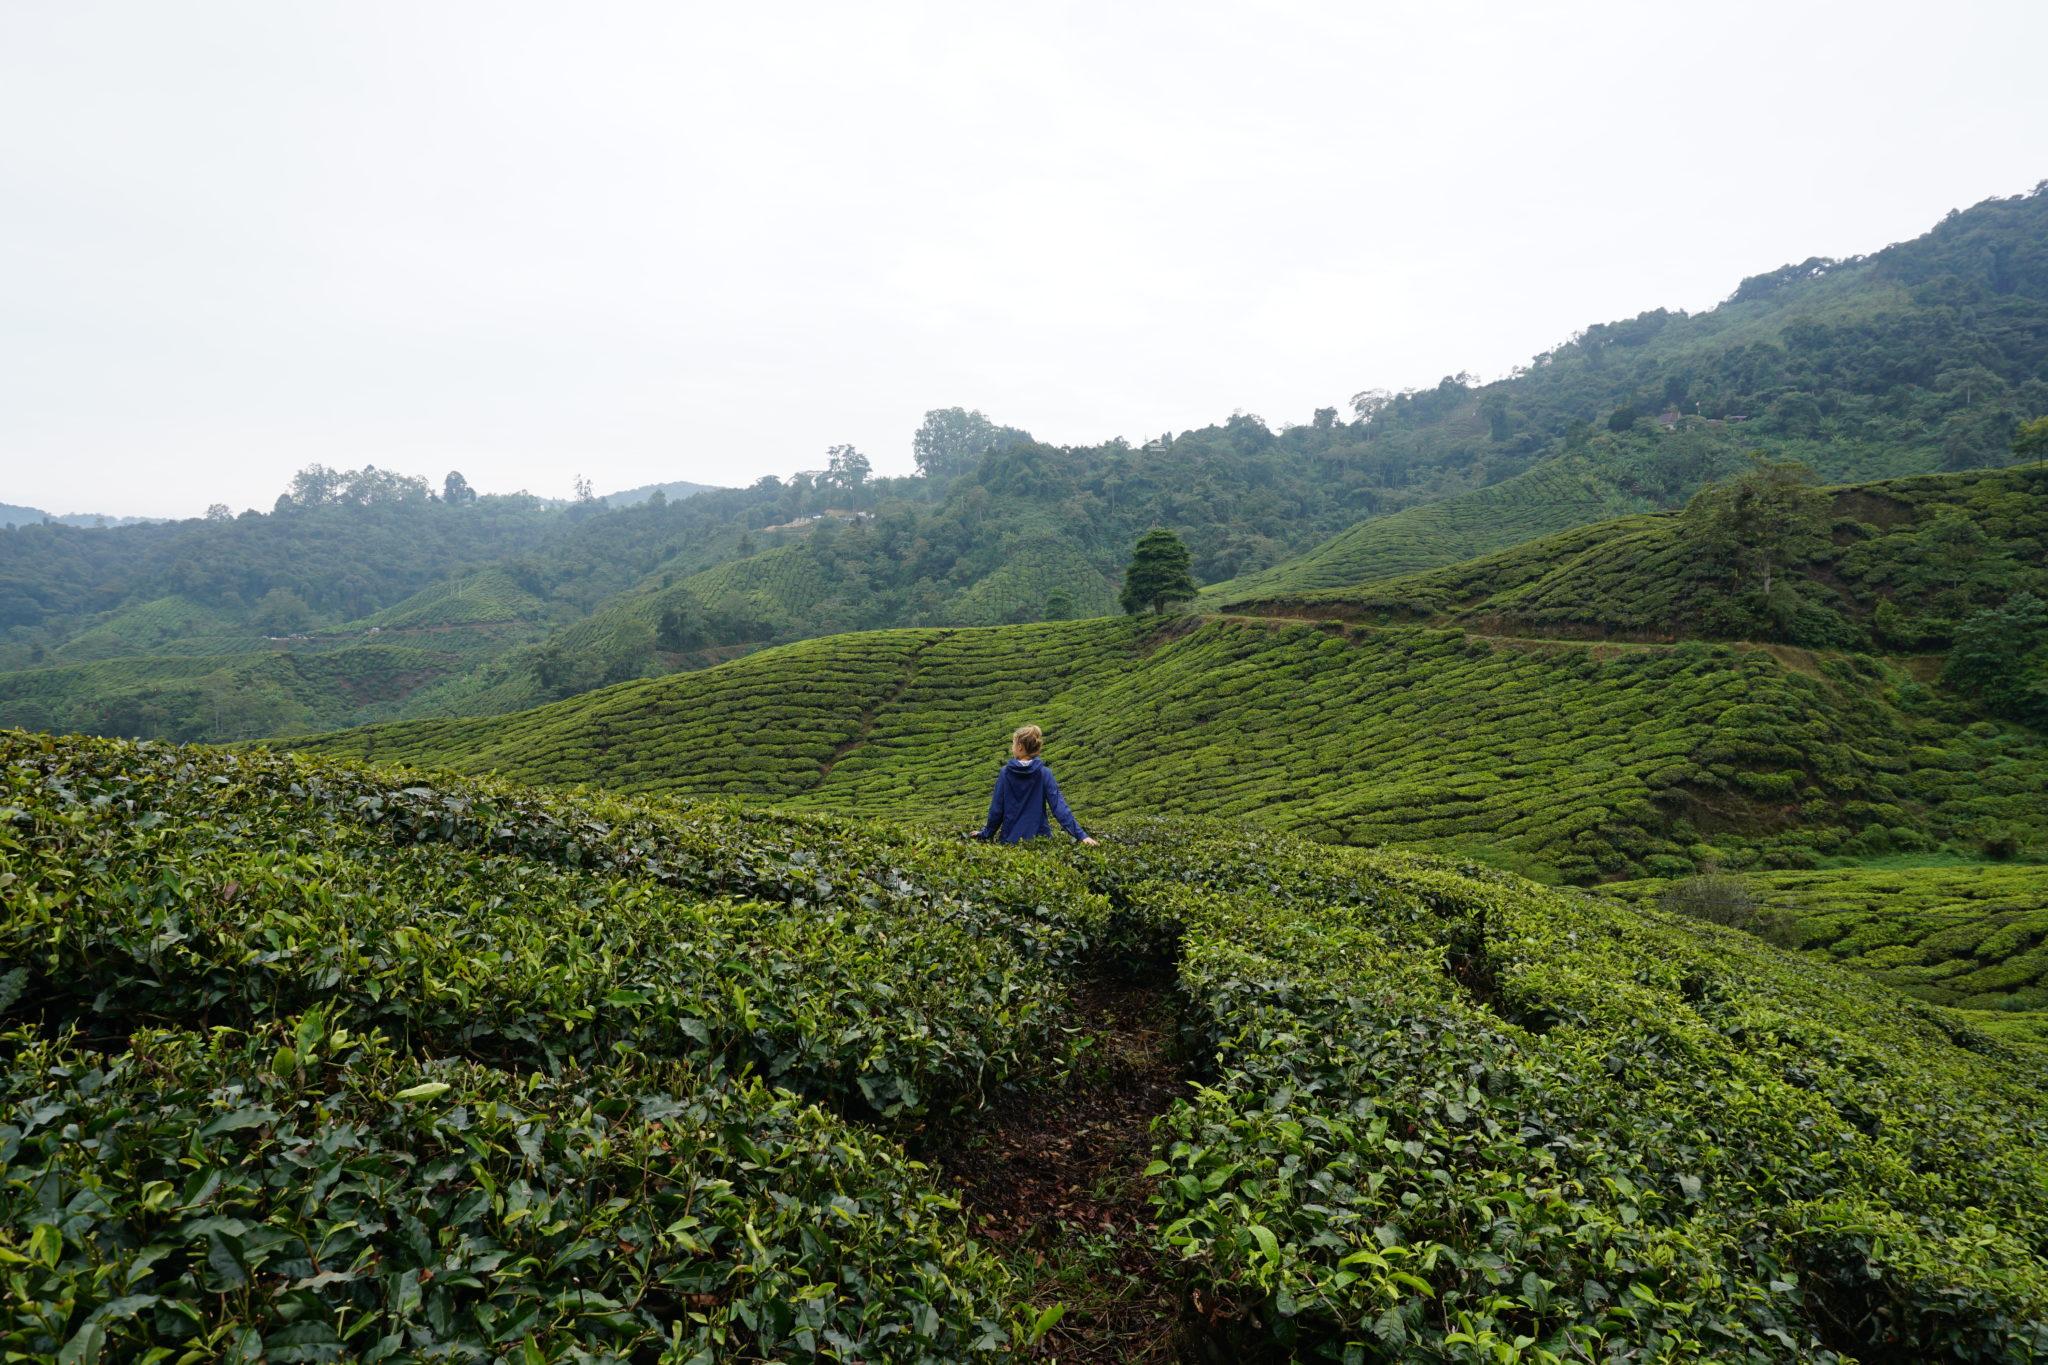 Mona in den Teefeldern der BOH-Teeplantage in den Cameron Highlands